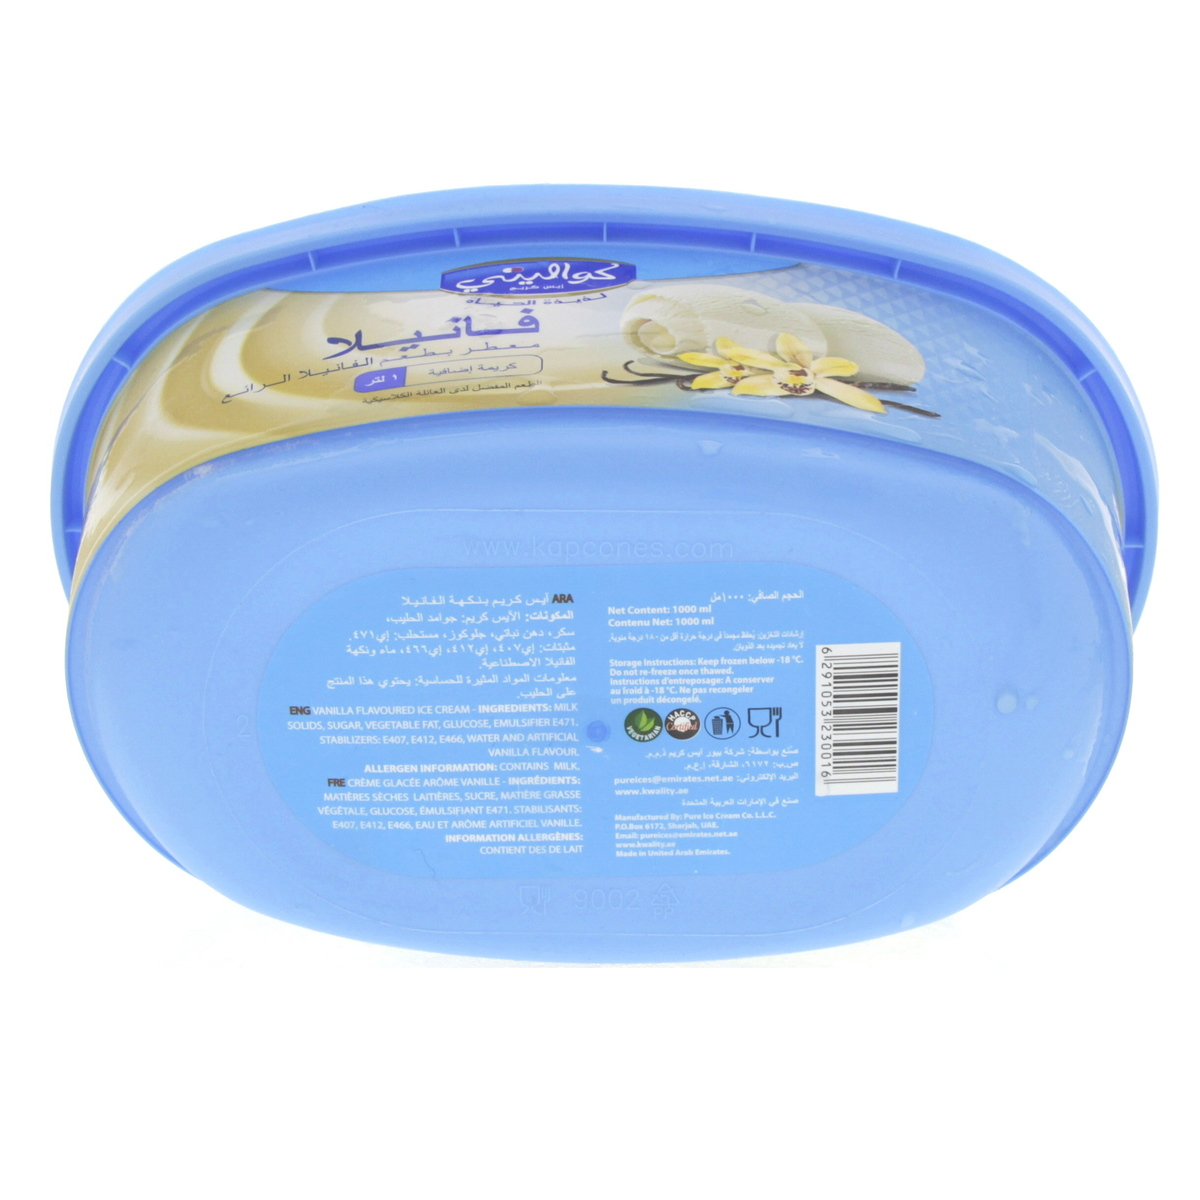 Buy Kwality Vanilla Ice Cream 1Litre - Ice Cream Take Home